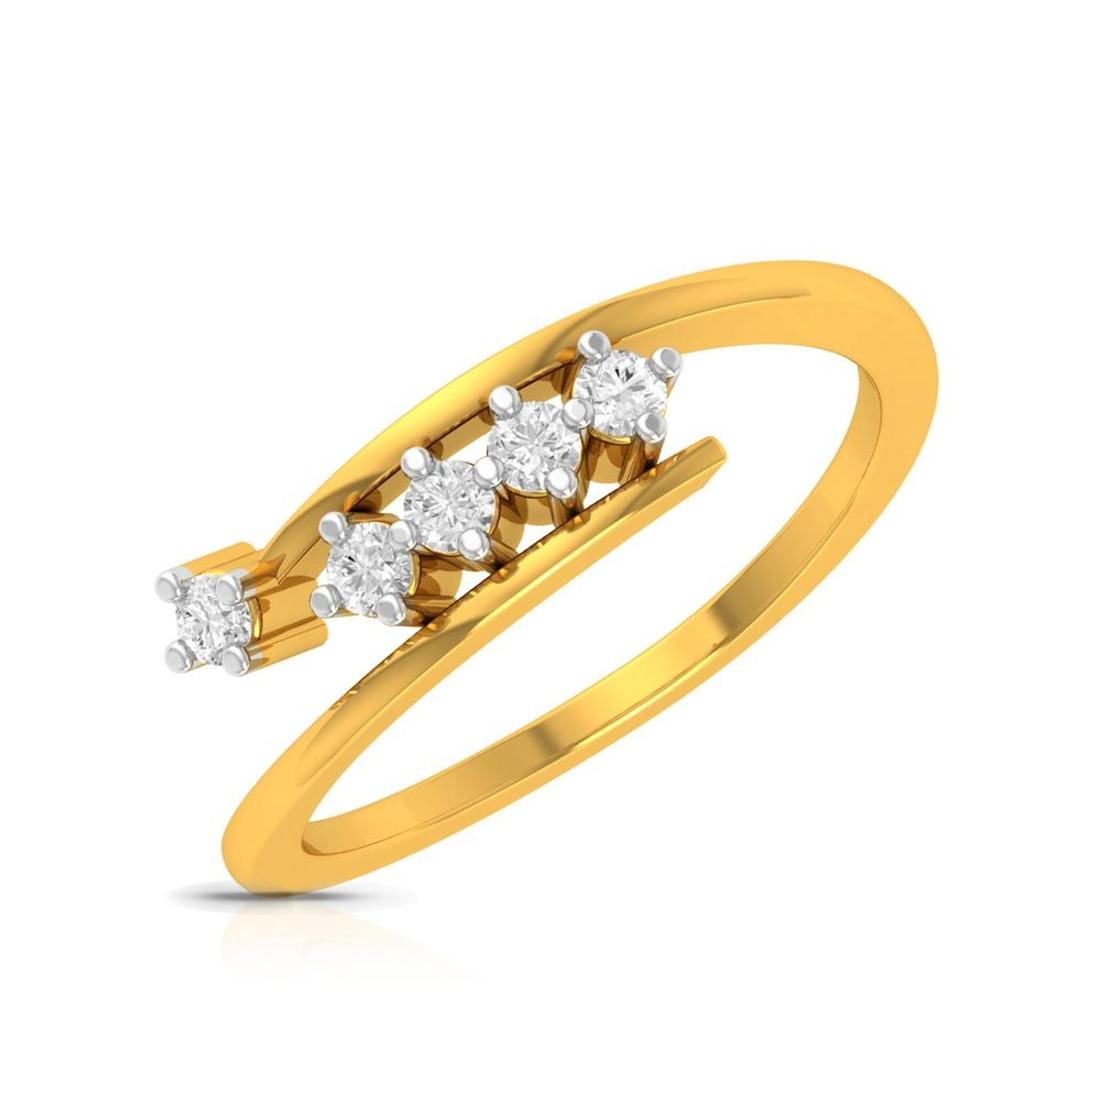 Buy Charu Jewels Diamond Ladies Ring CJLR0046 Online in India